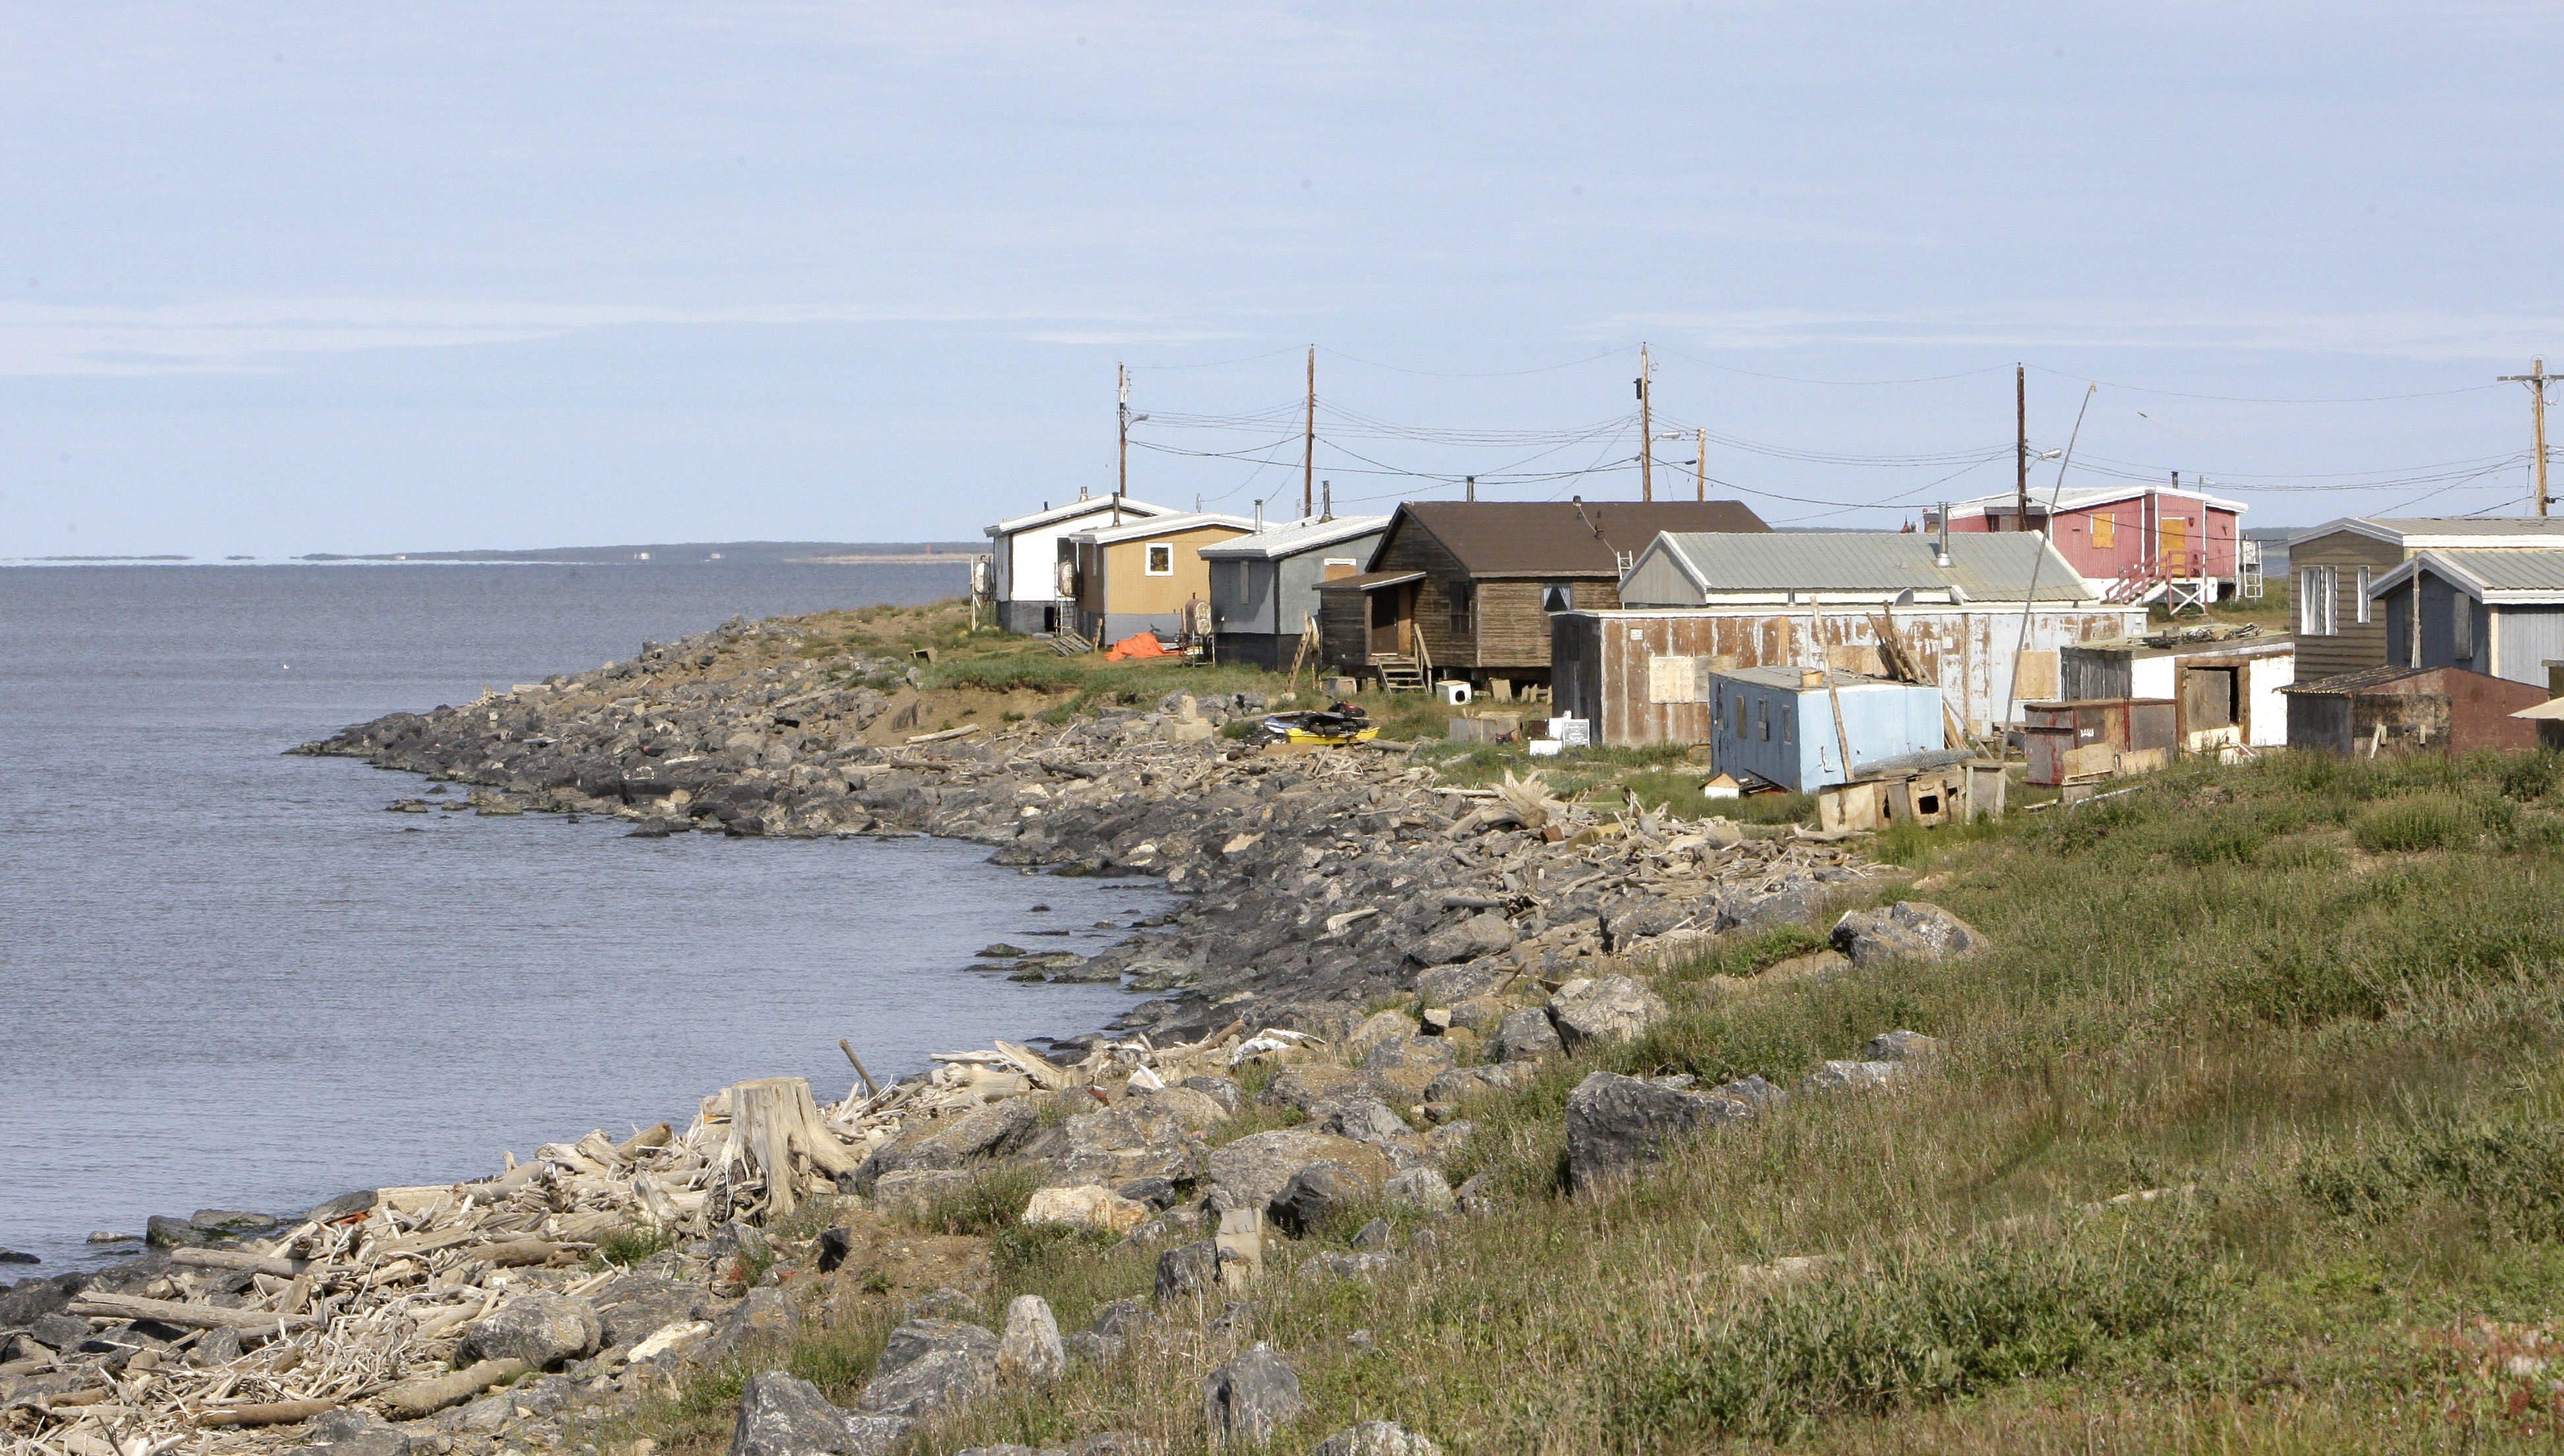 Tuktoyaktuk, Northwest Territories. Could this sleepy Arctic hamlet one day be an oil export terminal?